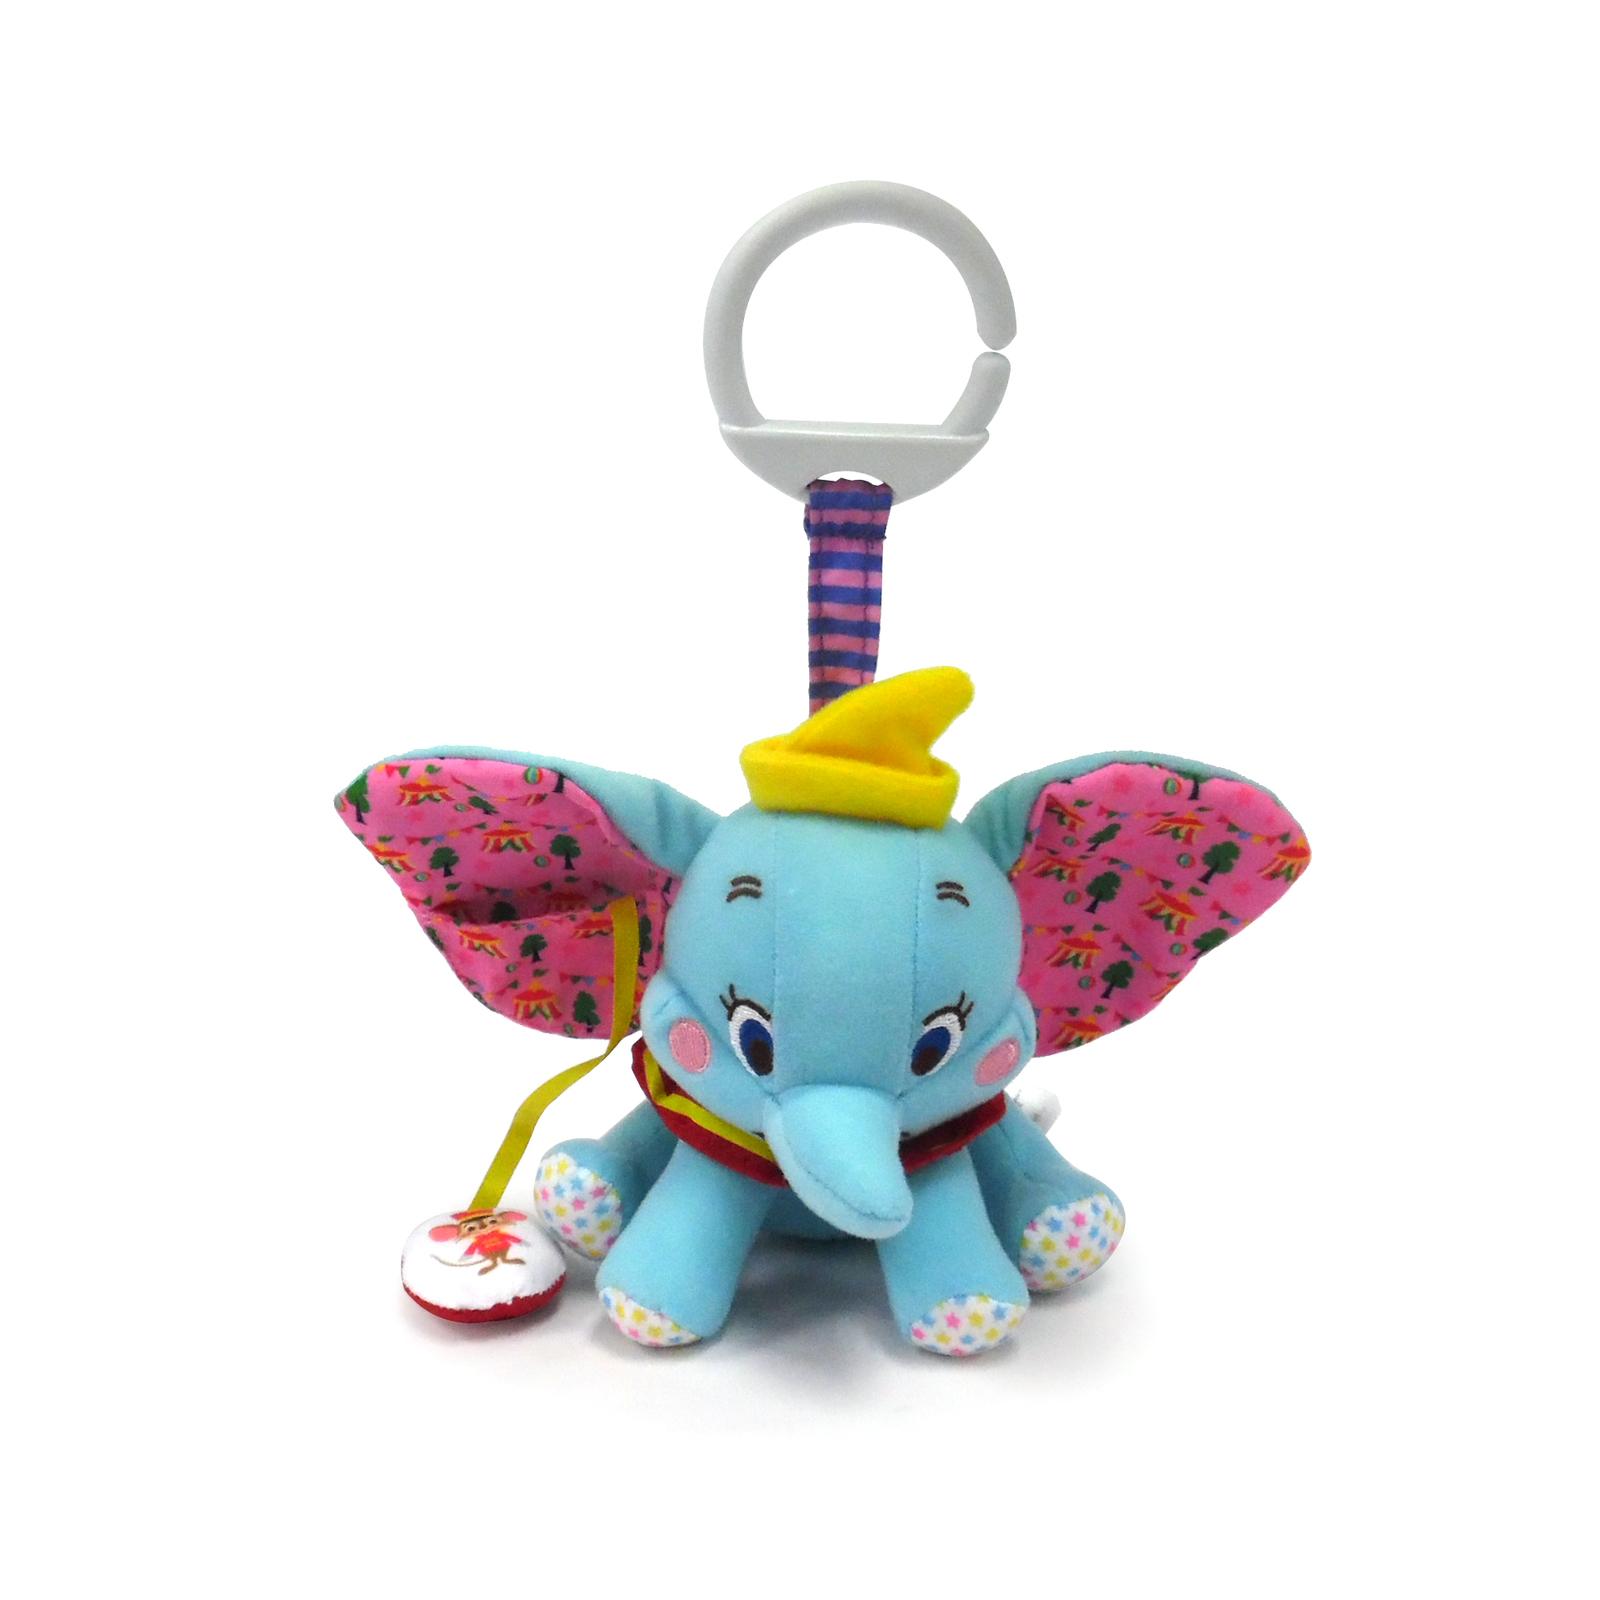 Dumbo Plush Pram Toy image